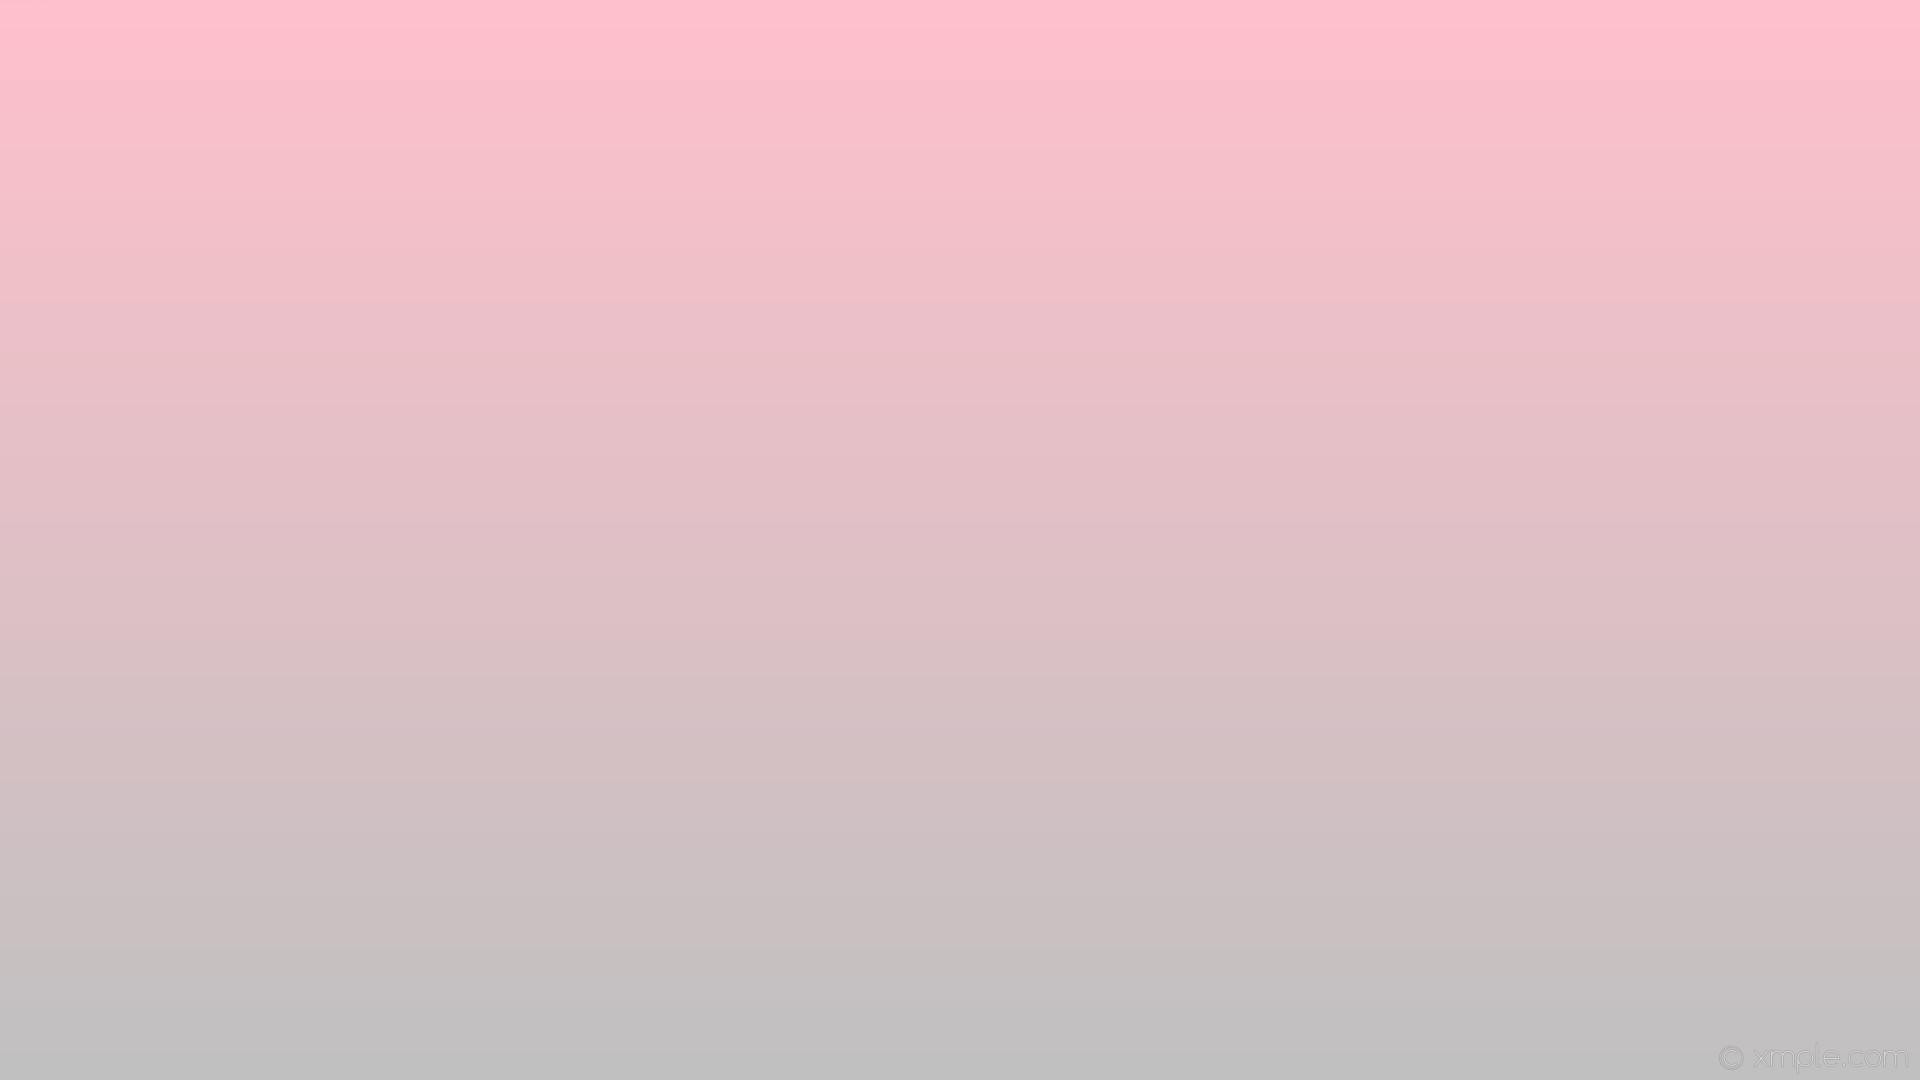 wallpaper pink linear grey gradient silver #ffc0cb #c0c0c0 90°